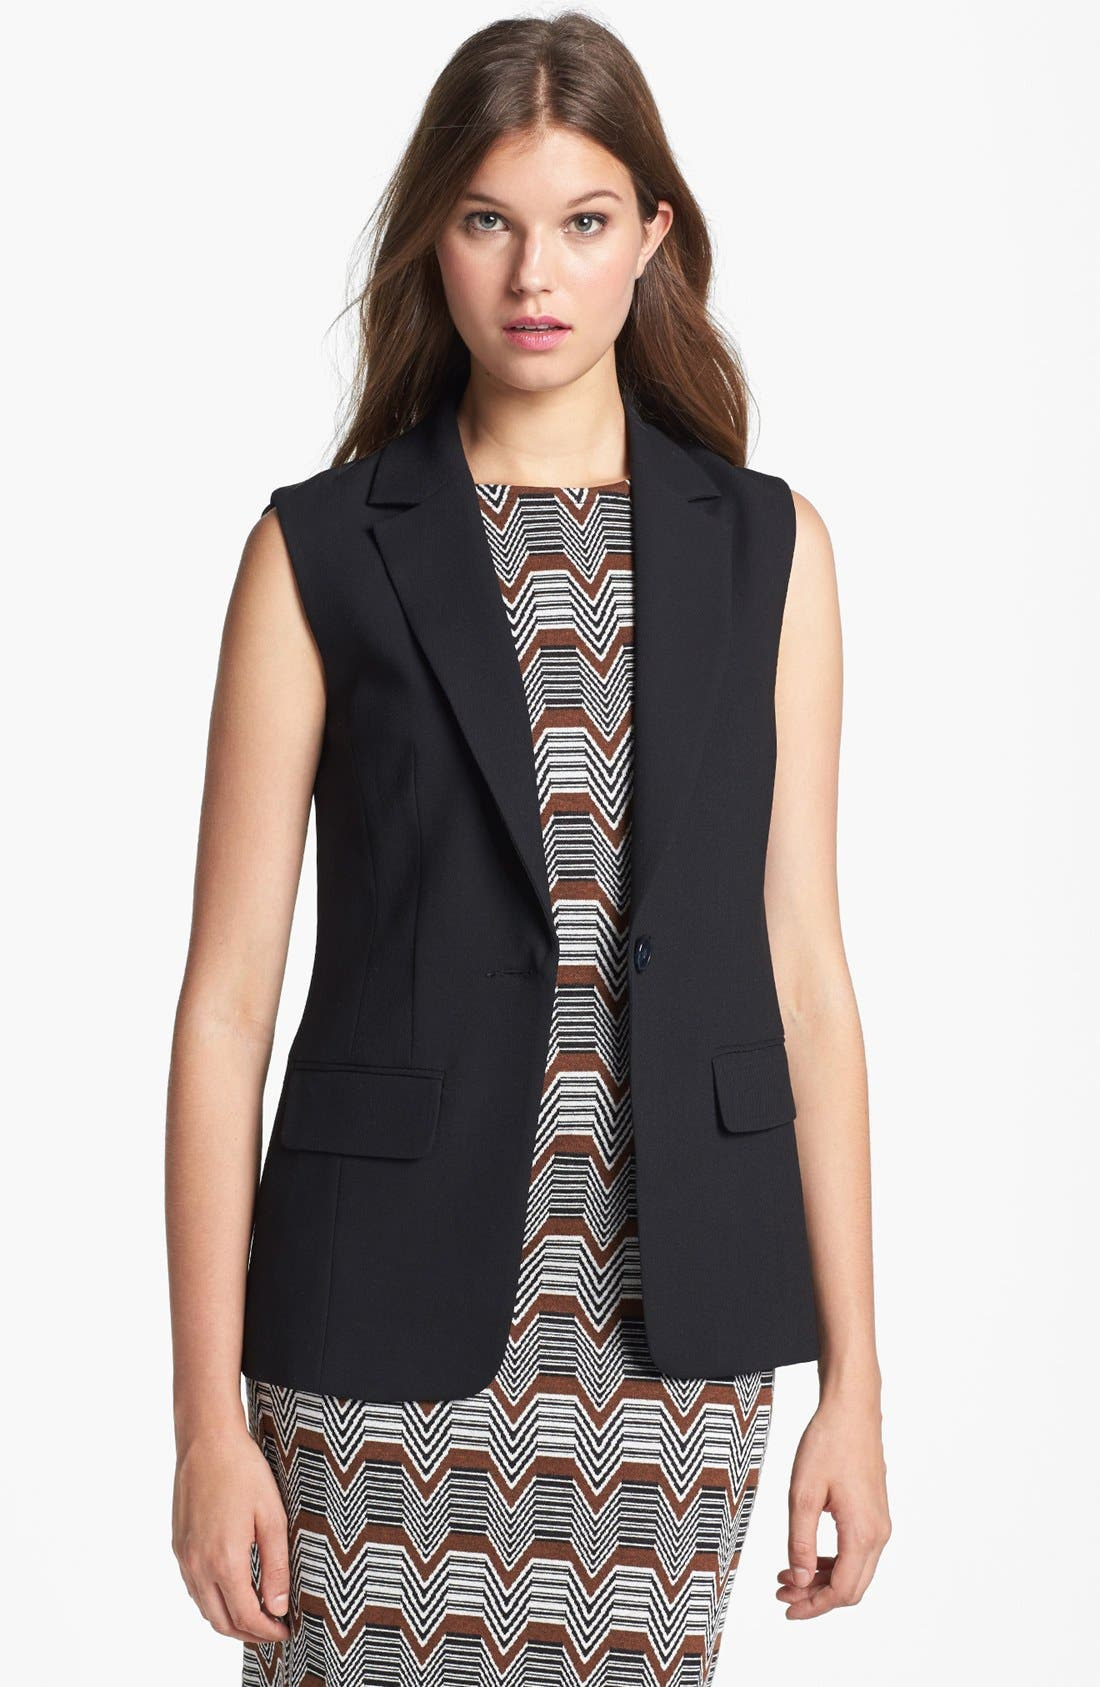 Alternate Image 1 Selected - Trina Turk 'Desia' Sleeveless Jacket